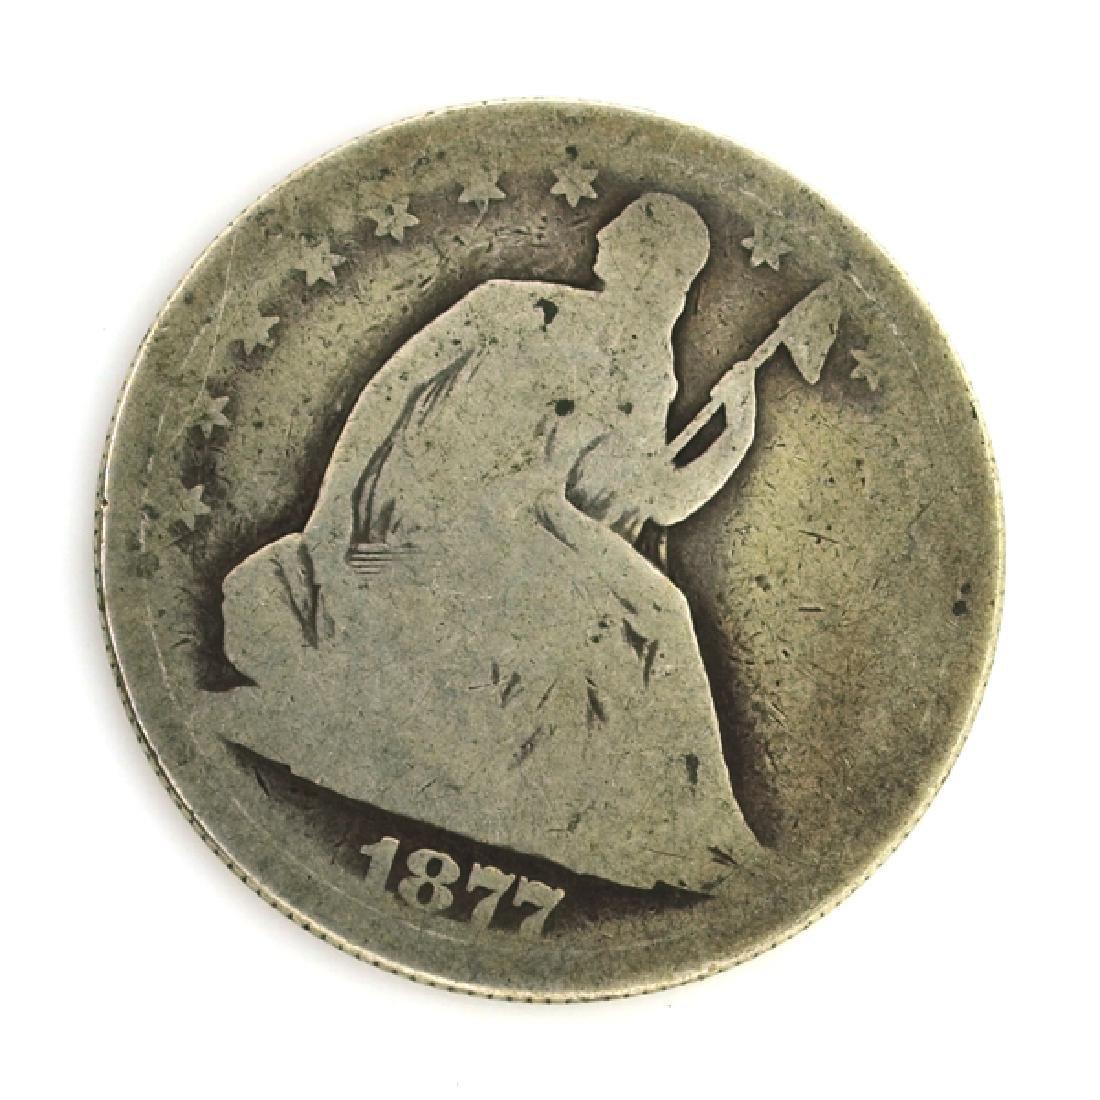 1877 Liberty Seated Half Dollar Coin  Coin